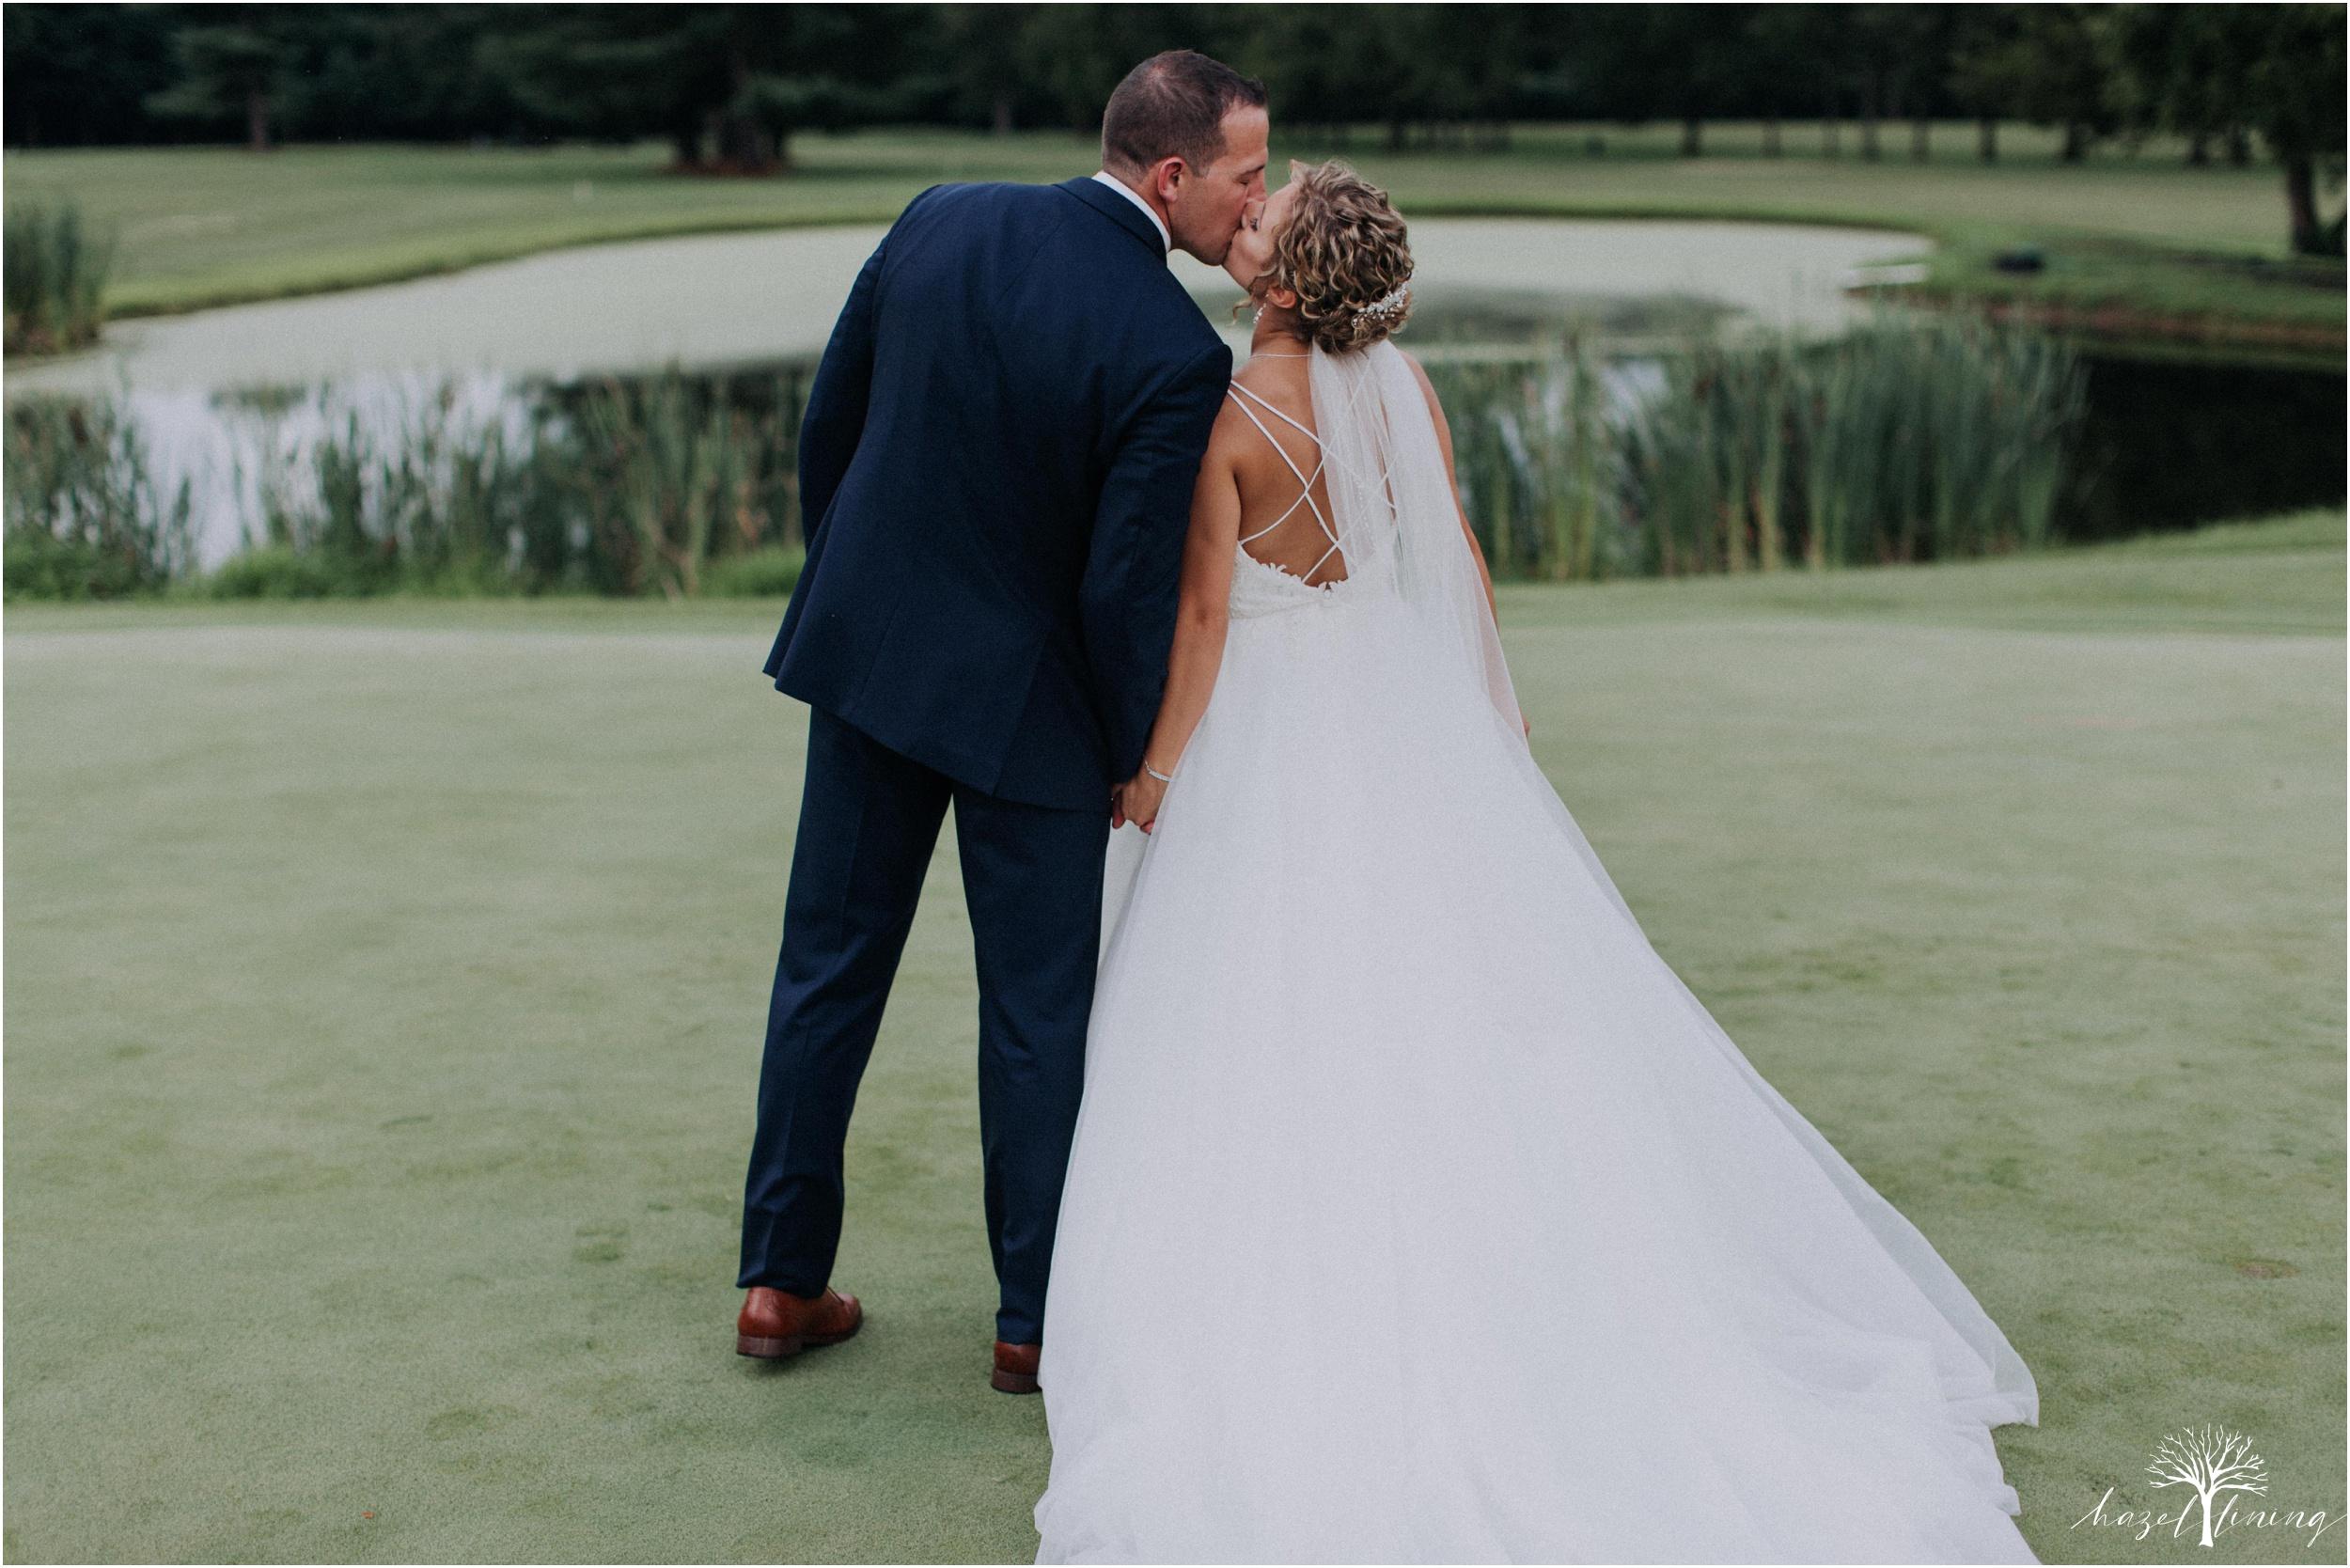 jonathan-weibel-becky-haywood-loft-at-sweetwater-cc-pennsburg-pennsylvania-rainy-day-summer-wedding-hazel-lining-travel-wedding-elopement-photography_0086.jpg